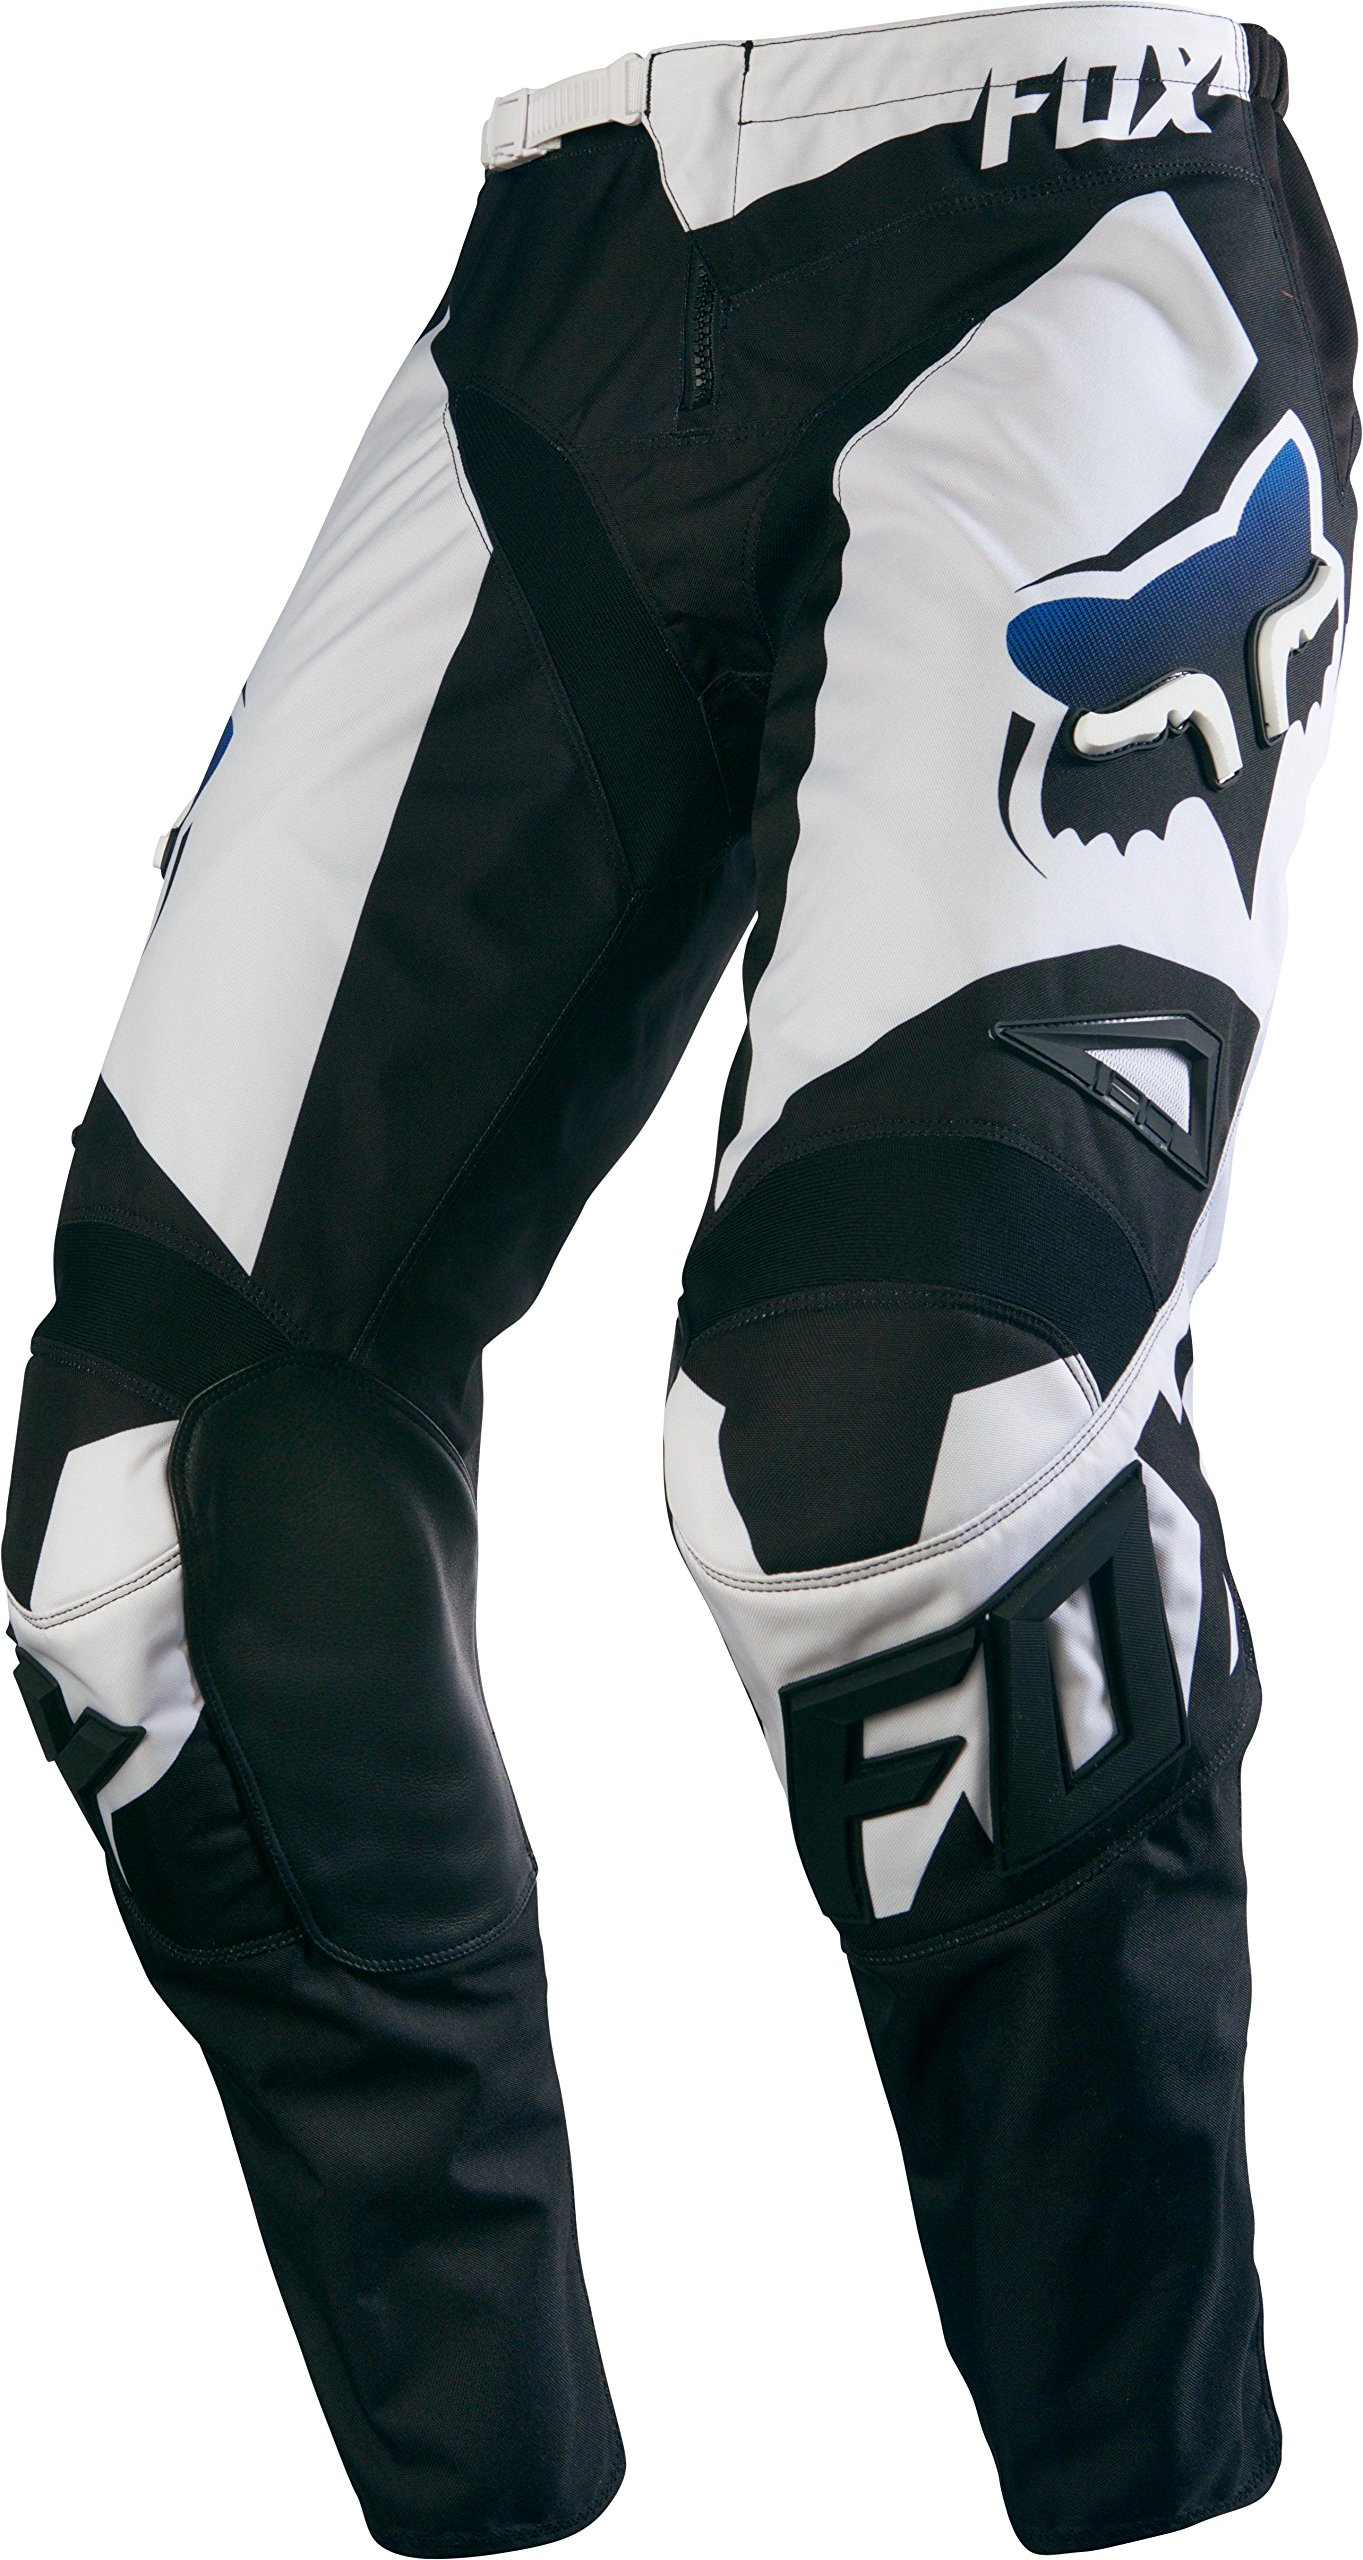 2016 Fox Racing 180 Race Men's Off-Road Motorcycle Pants - Black / Size 36